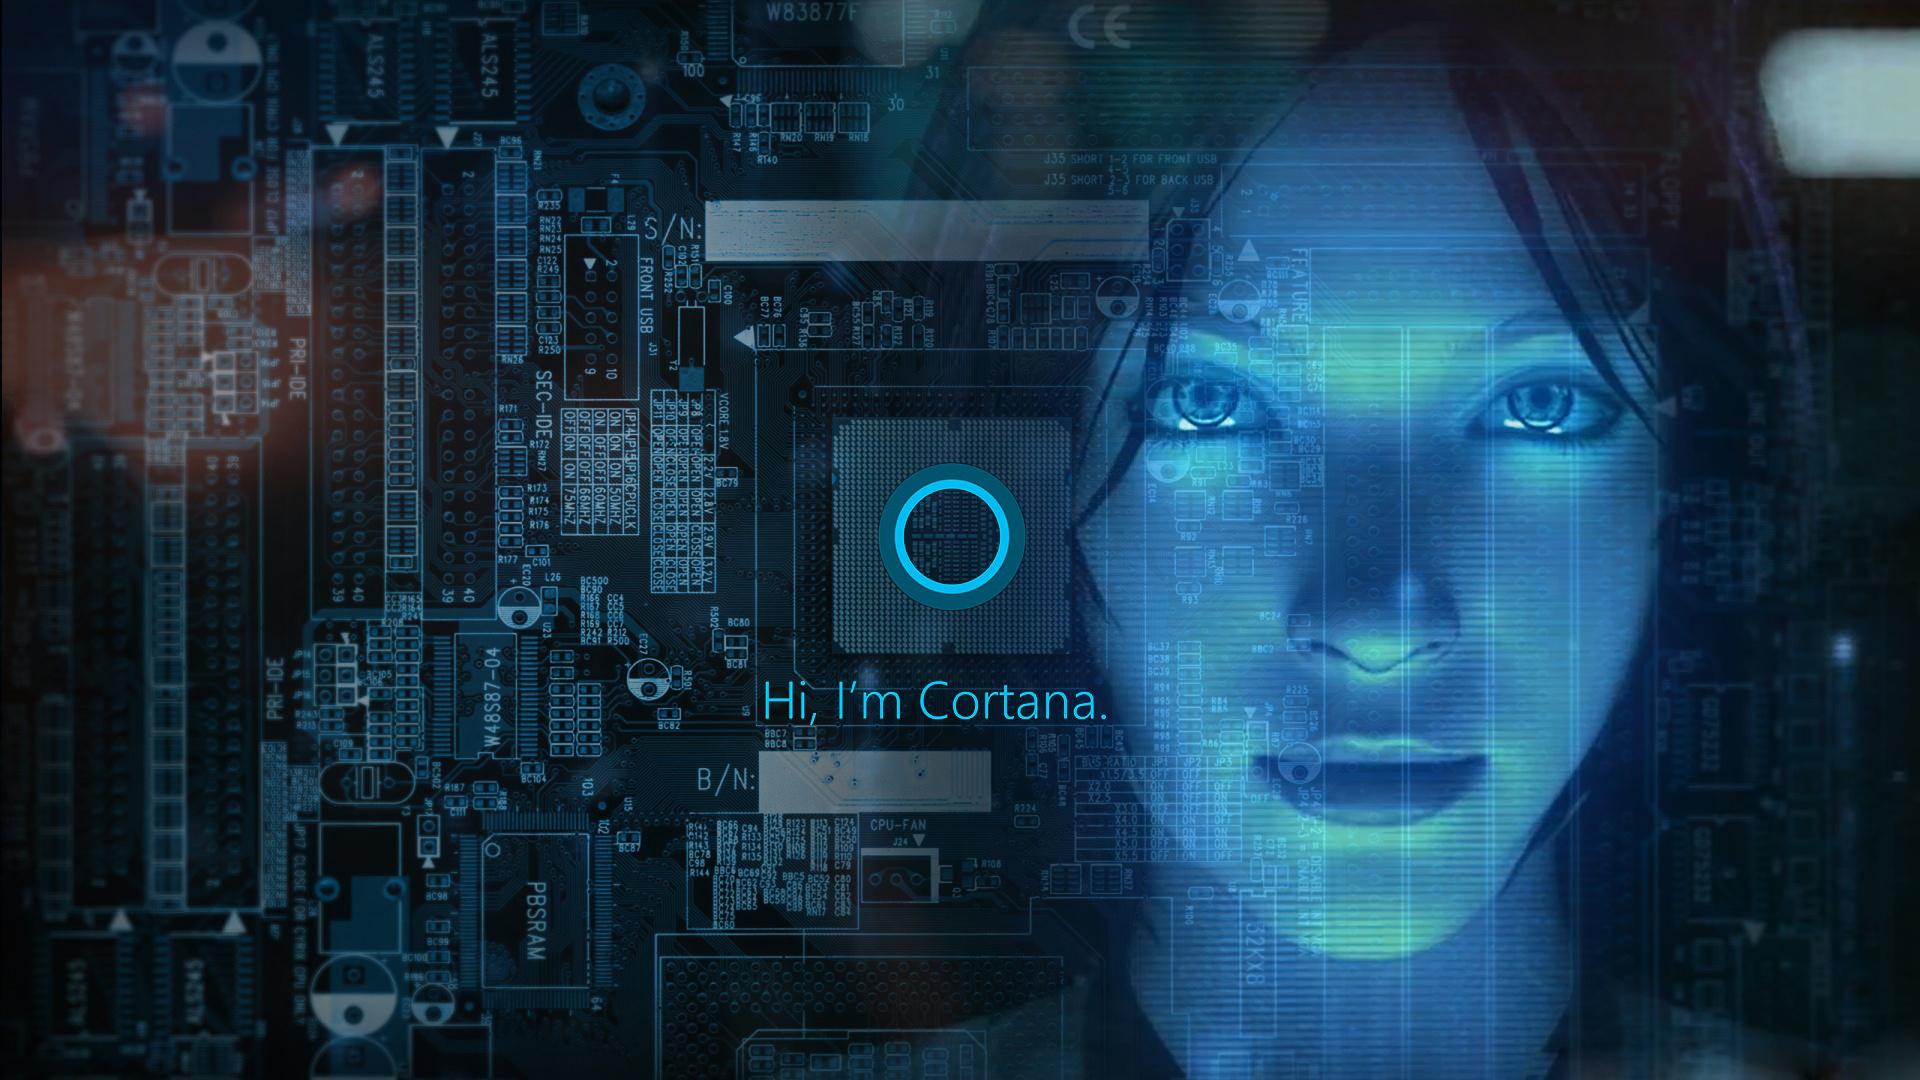 Cortana Halo Images   Windows Phone Voice Hi Im Cortana 1920x1080